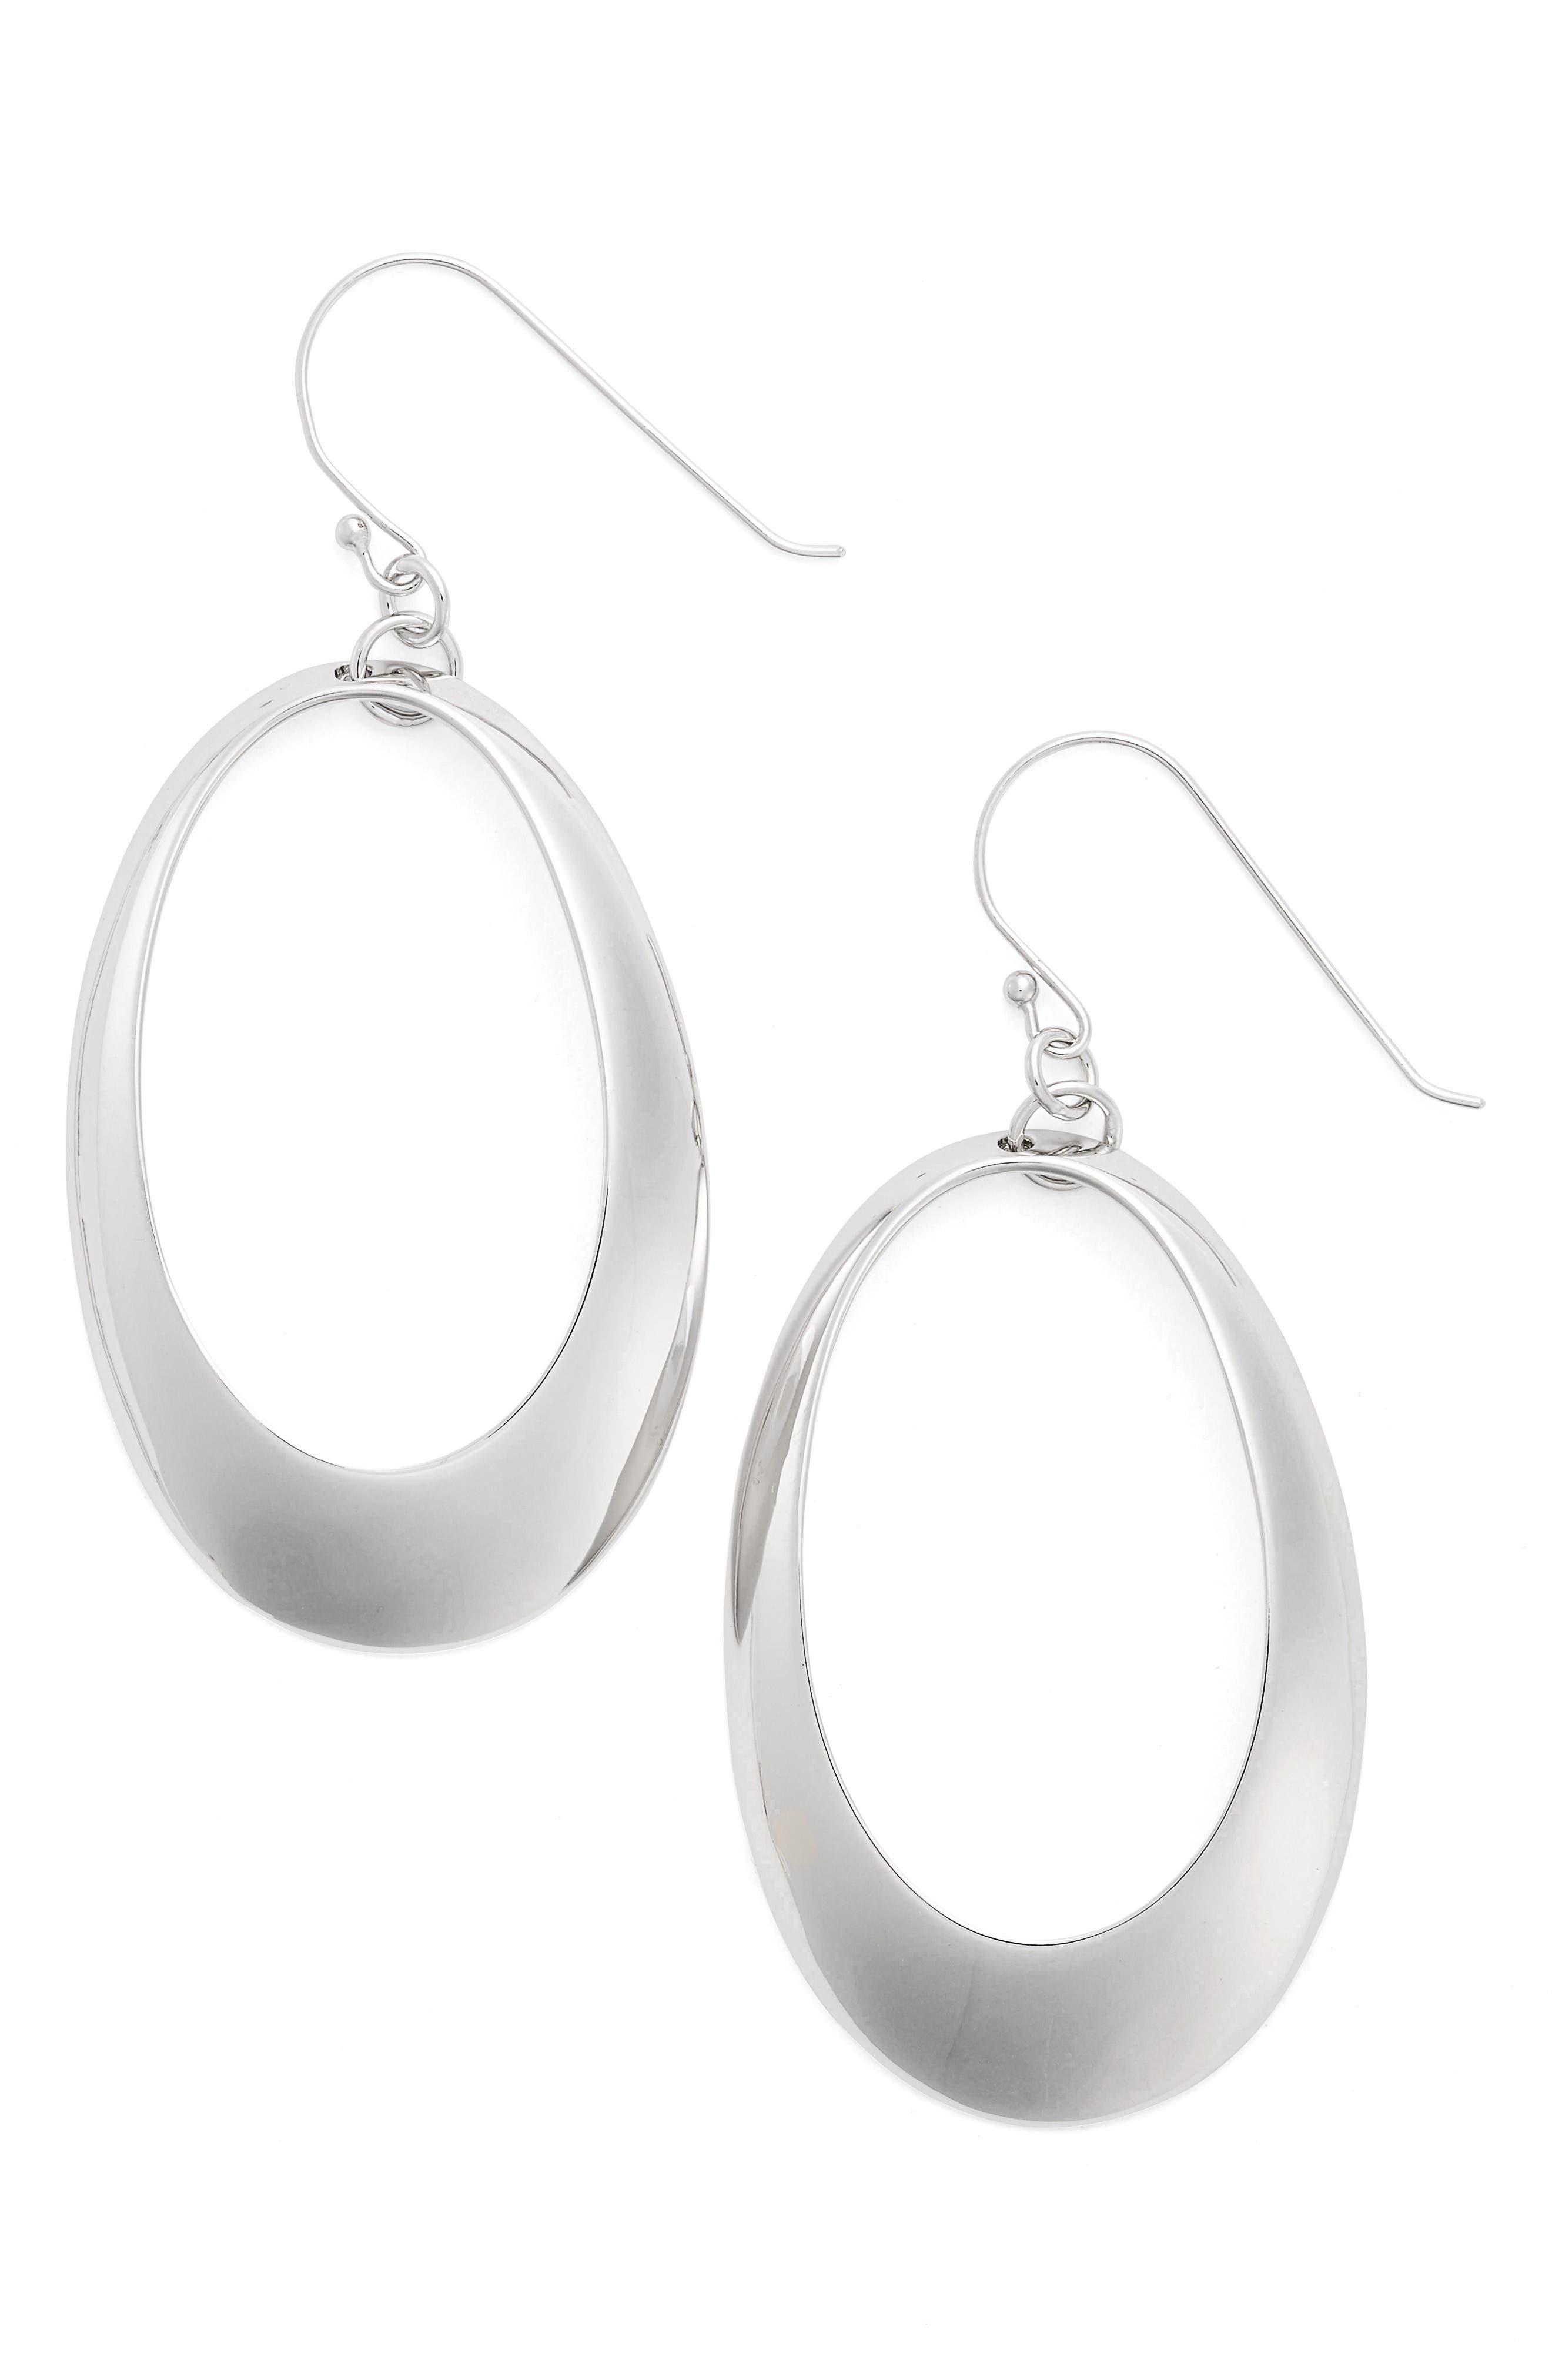 Main Image - Argento Vivo Large Oval Drop Earrings